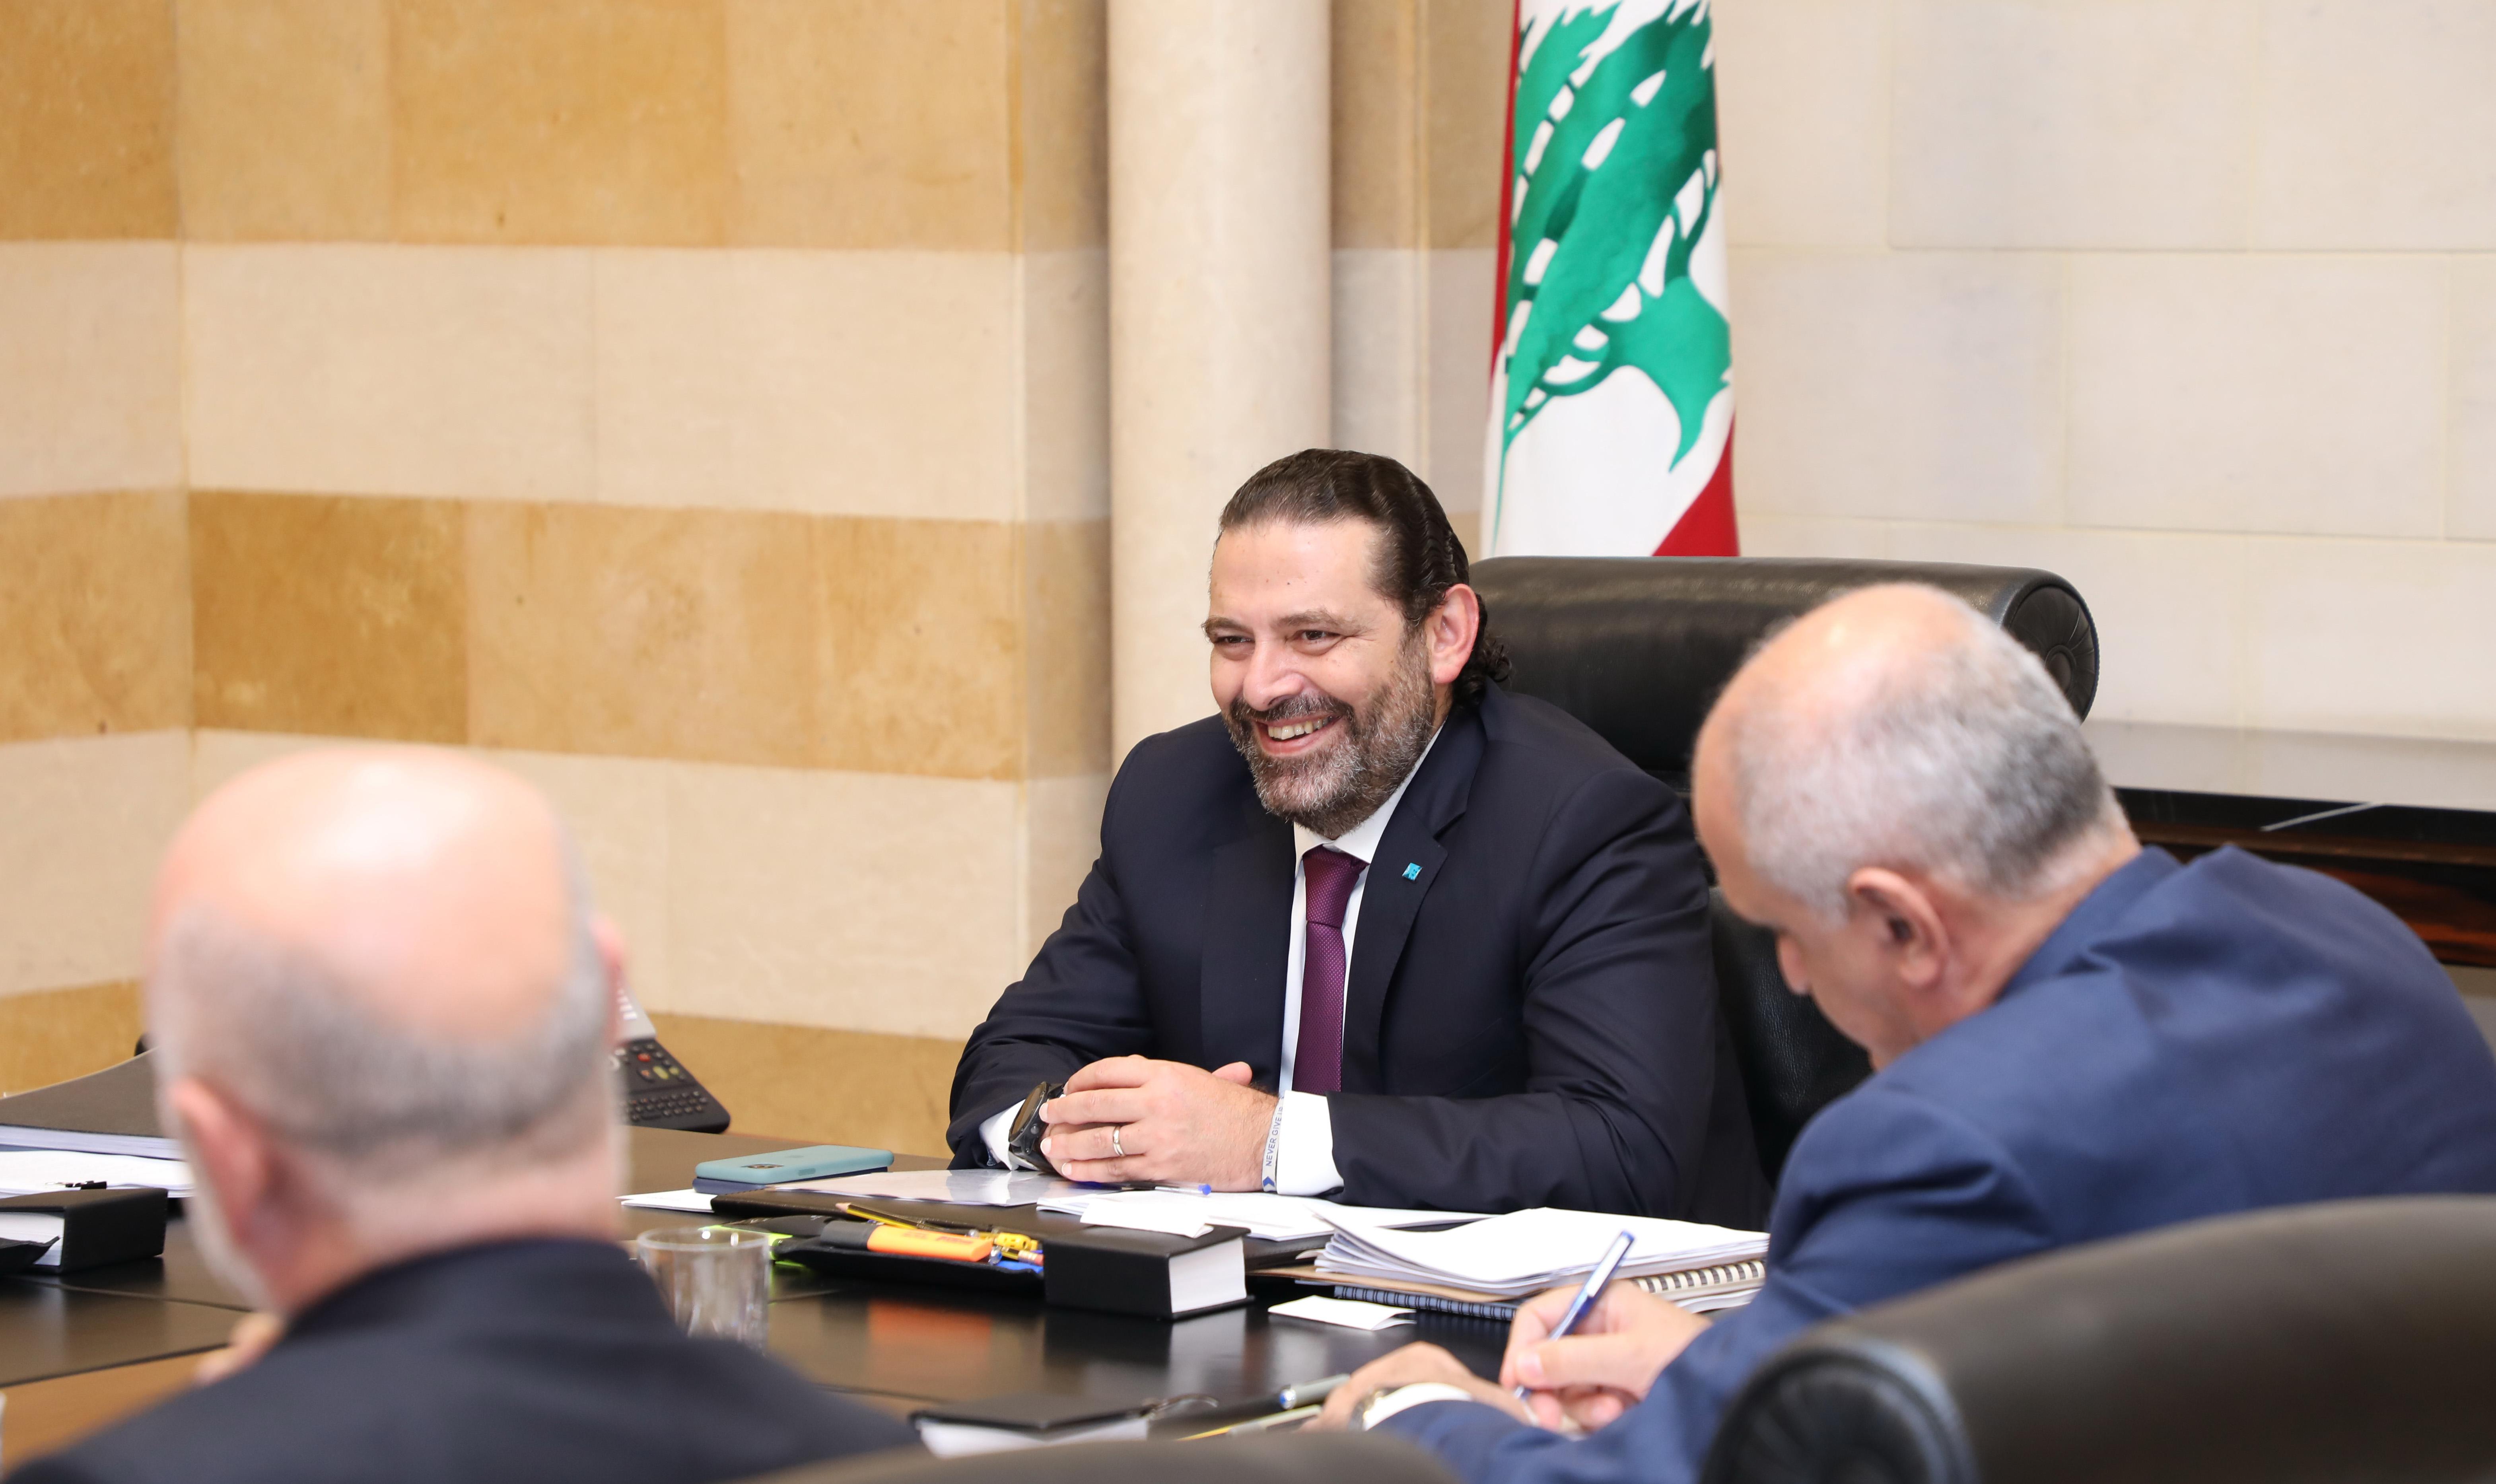 Pr Minister Saad Hariri Heading a Ministerial Council 3